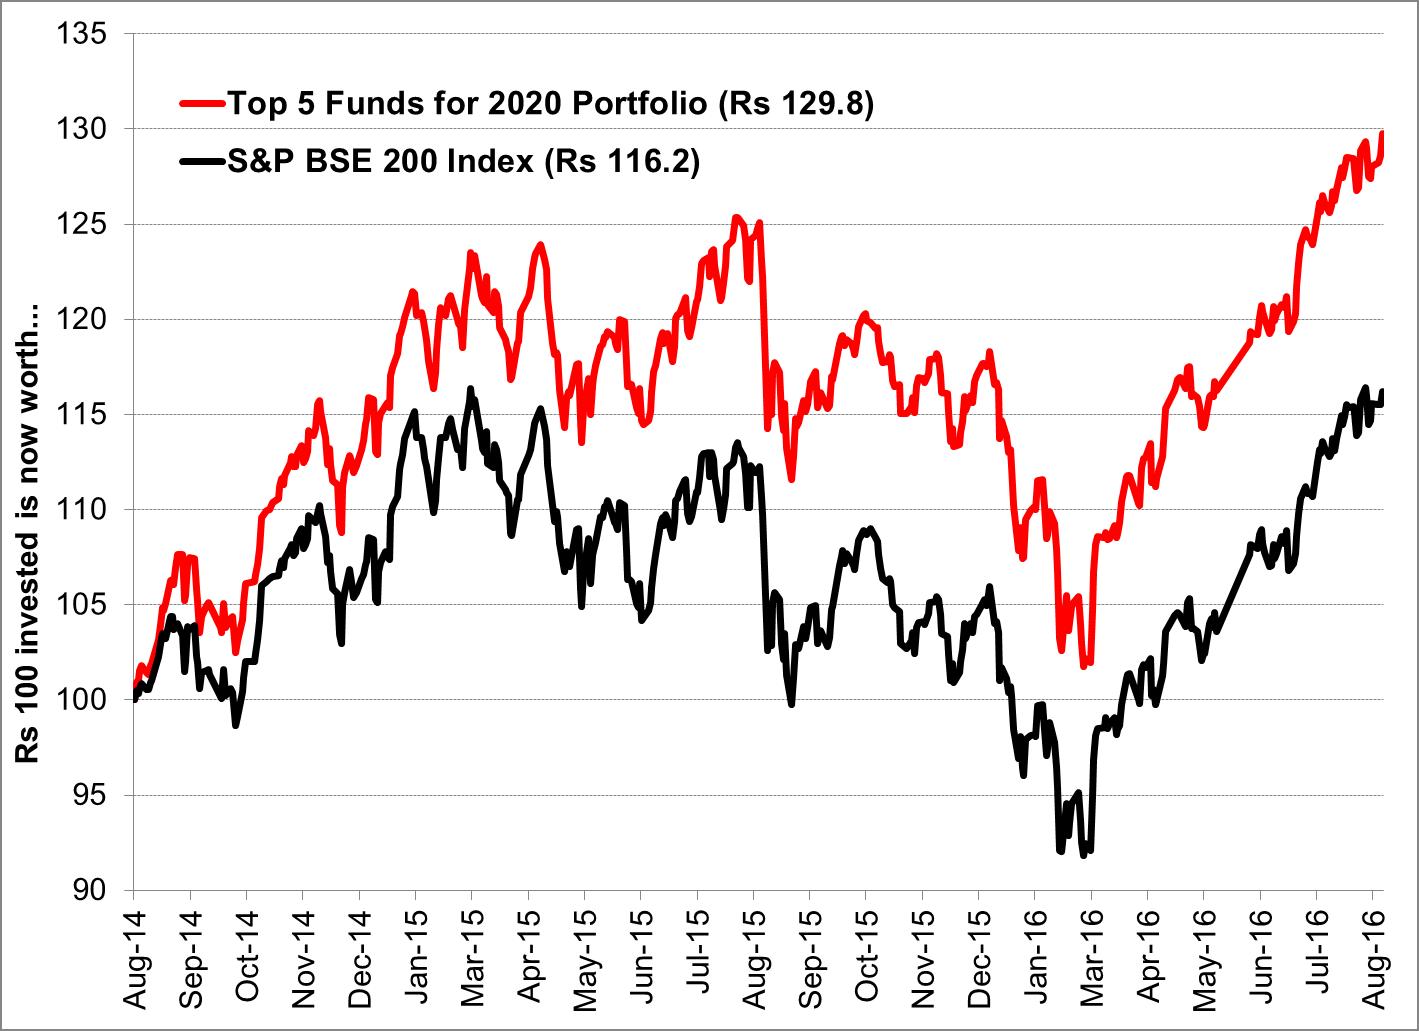 Top 5 Funds for 2020 Portfolio v/s S&P BSE 200 Index